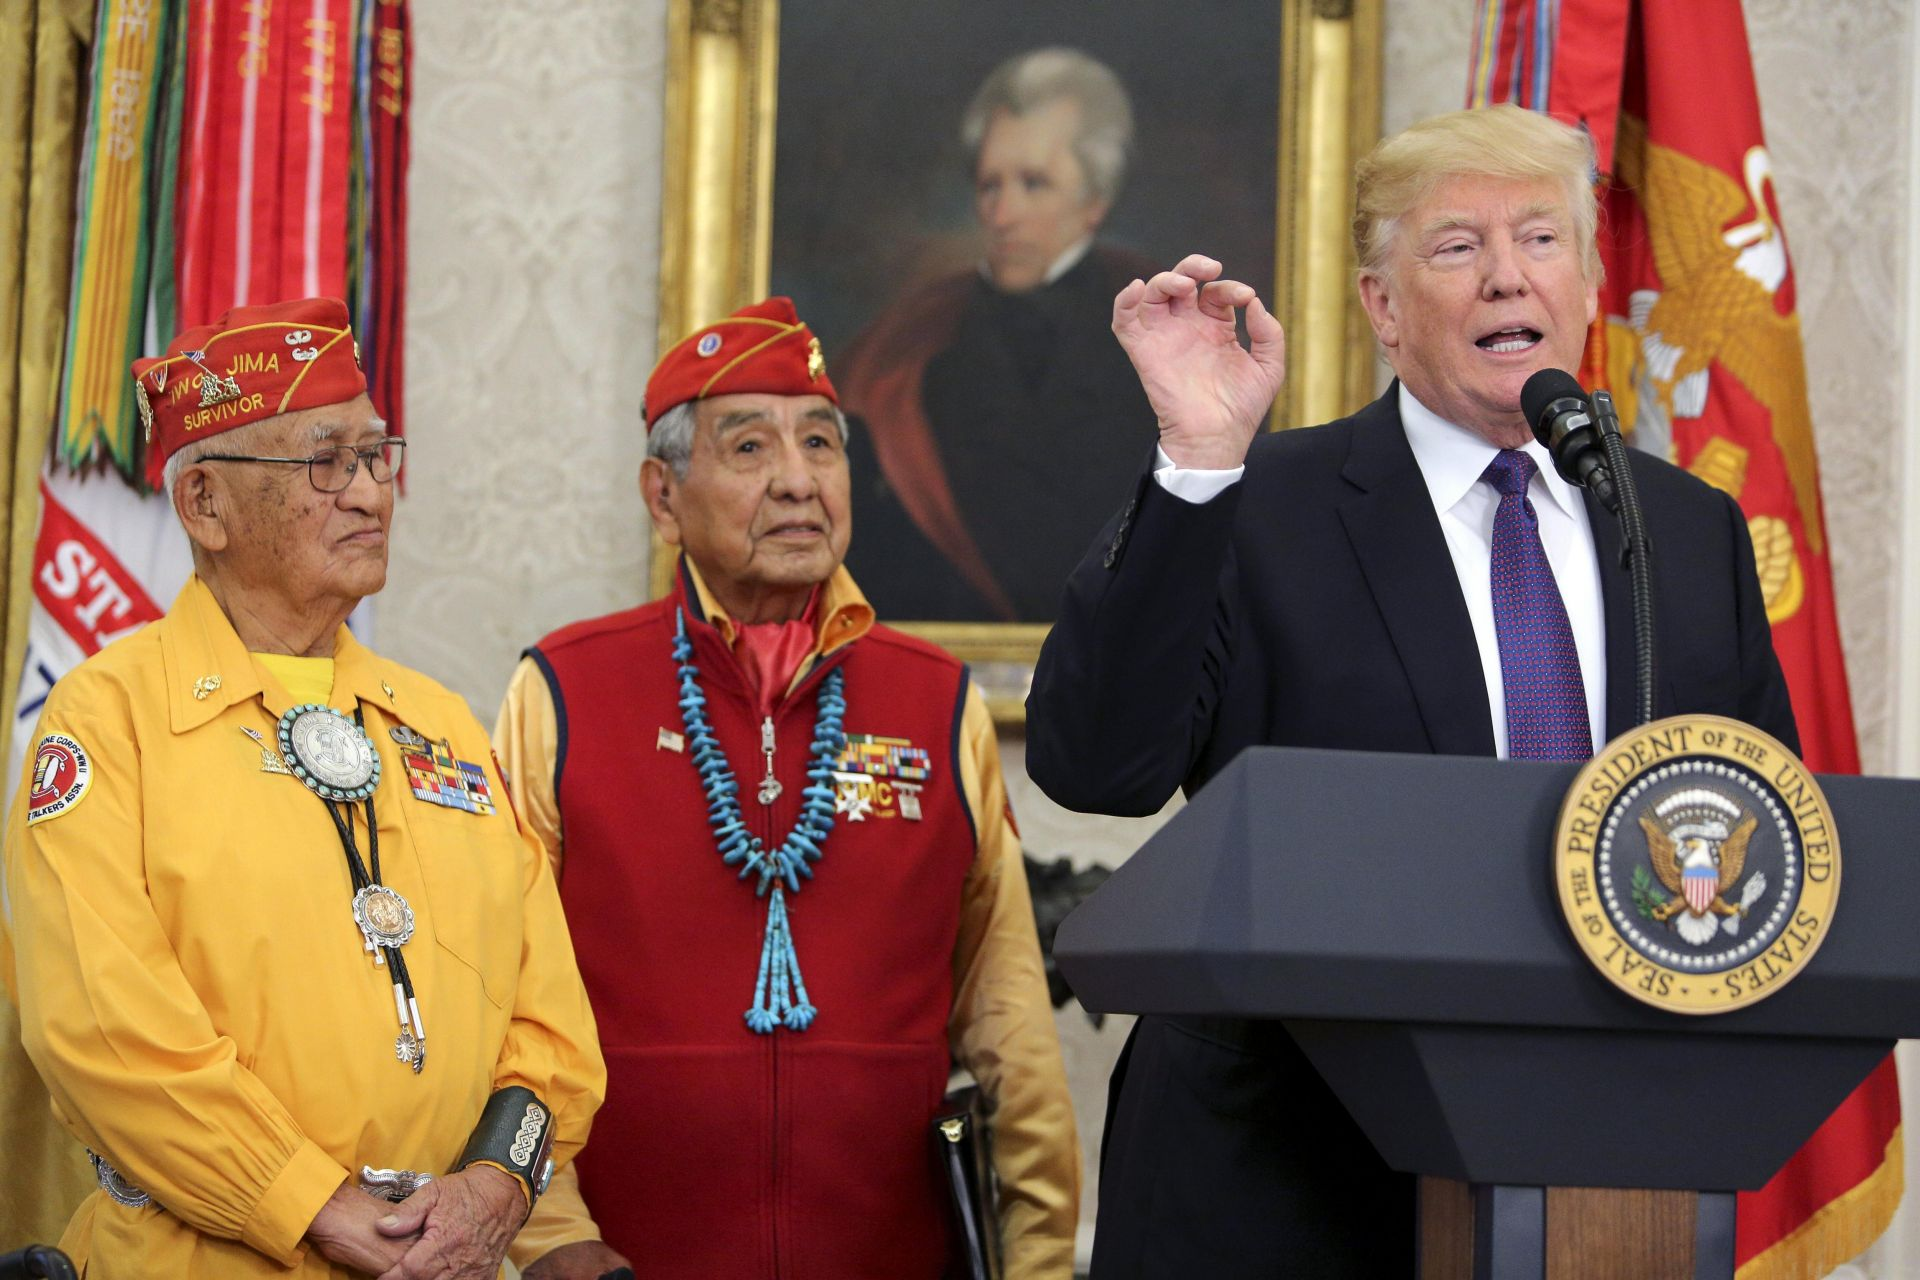 Trump crea polémica por llamar Pocahontas a senadora en reunión con indígenas